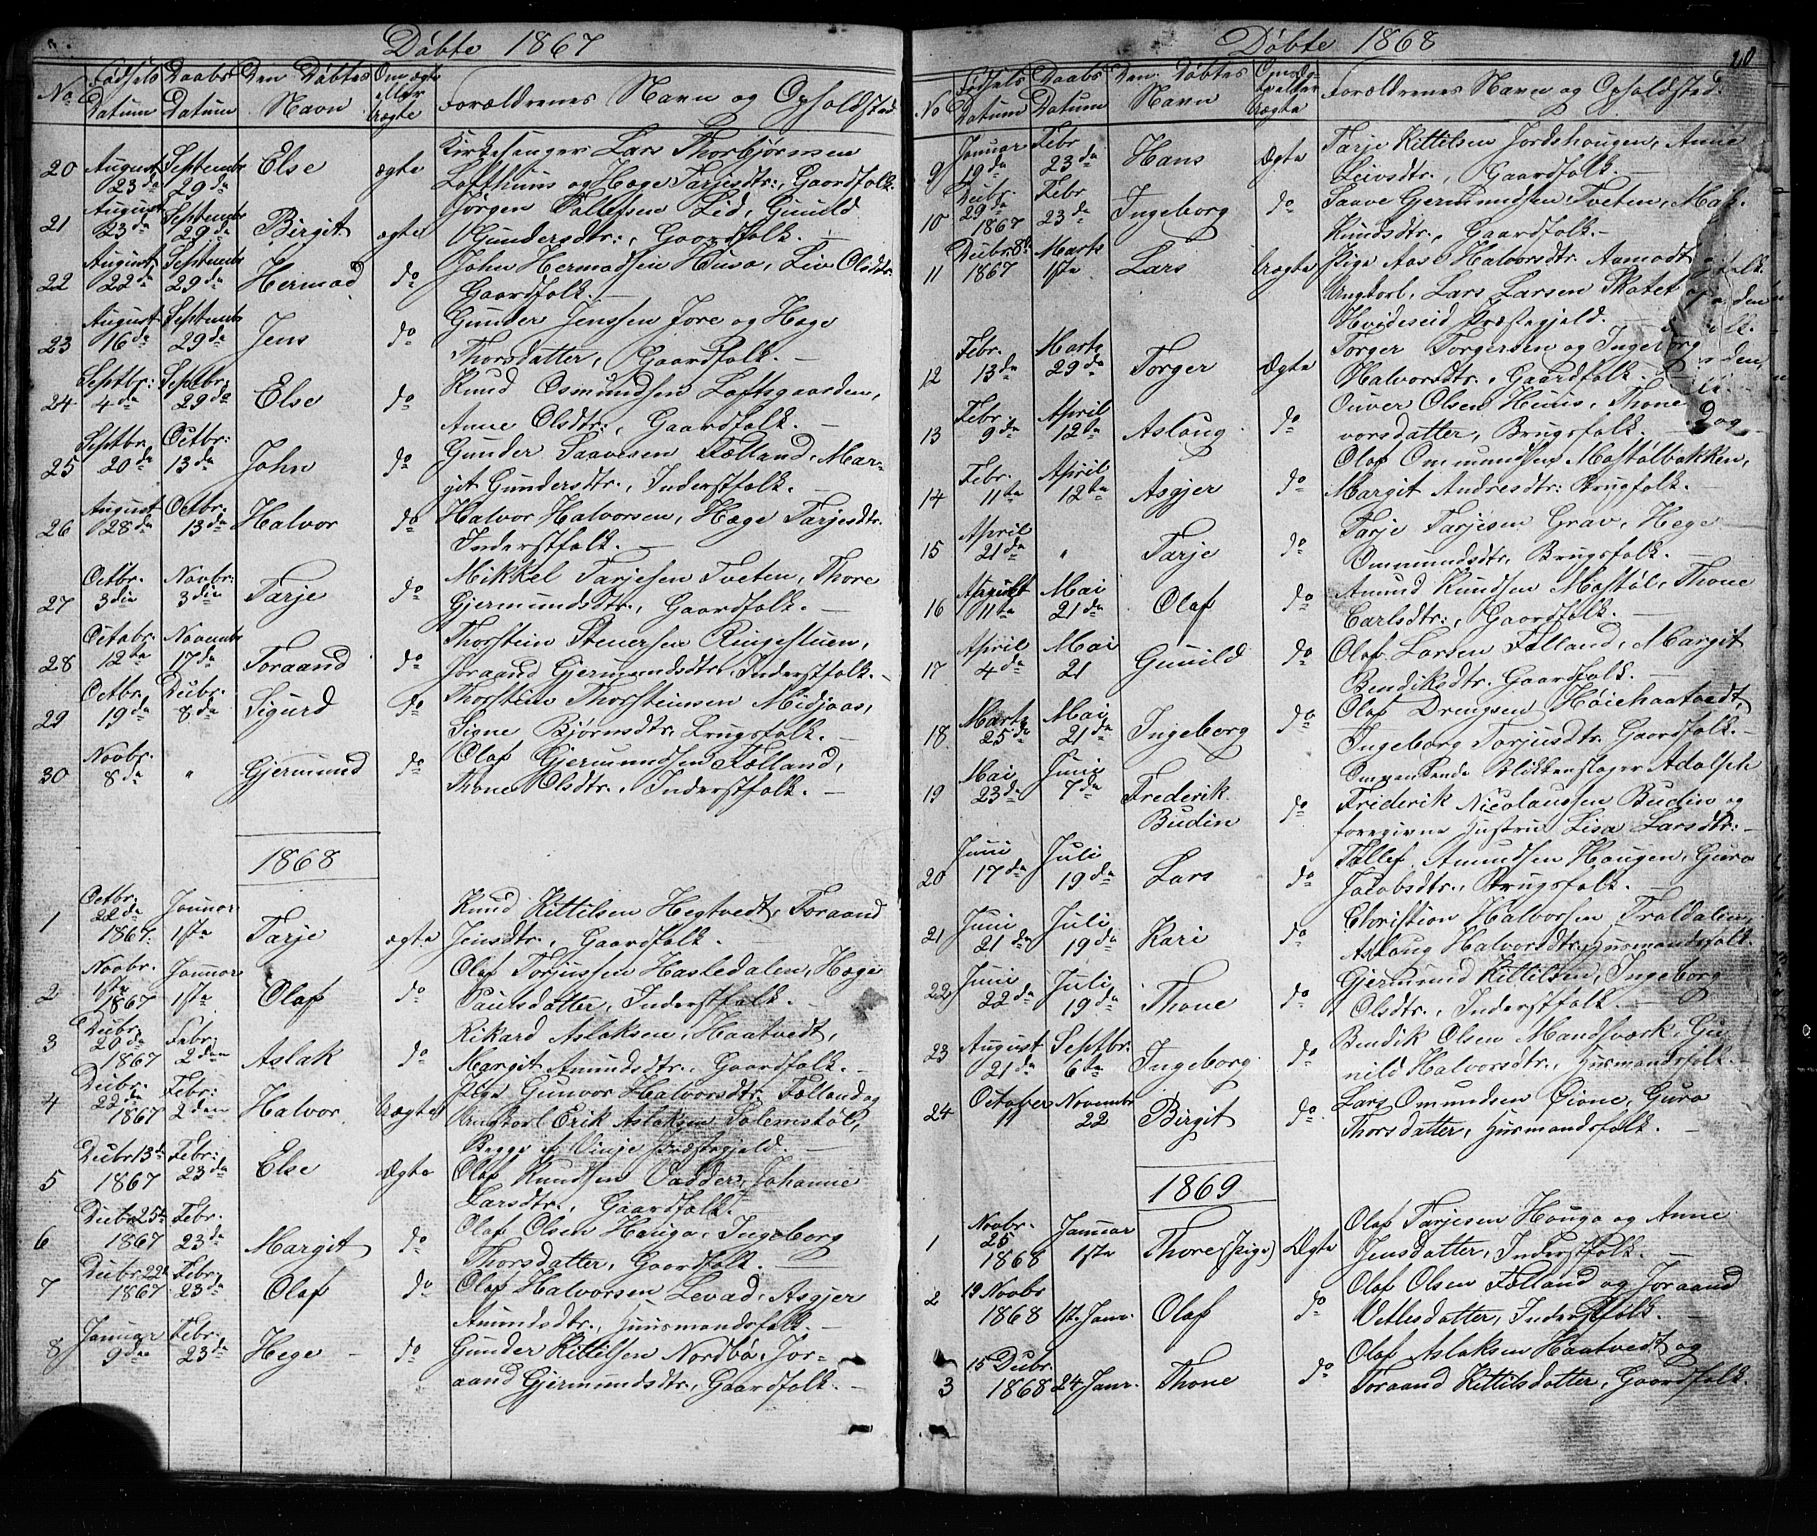 SAKO, Mo kirkebøker, G/Ga/L0001: Klokkerbok nr. I 1, 1851-1891, s. 20